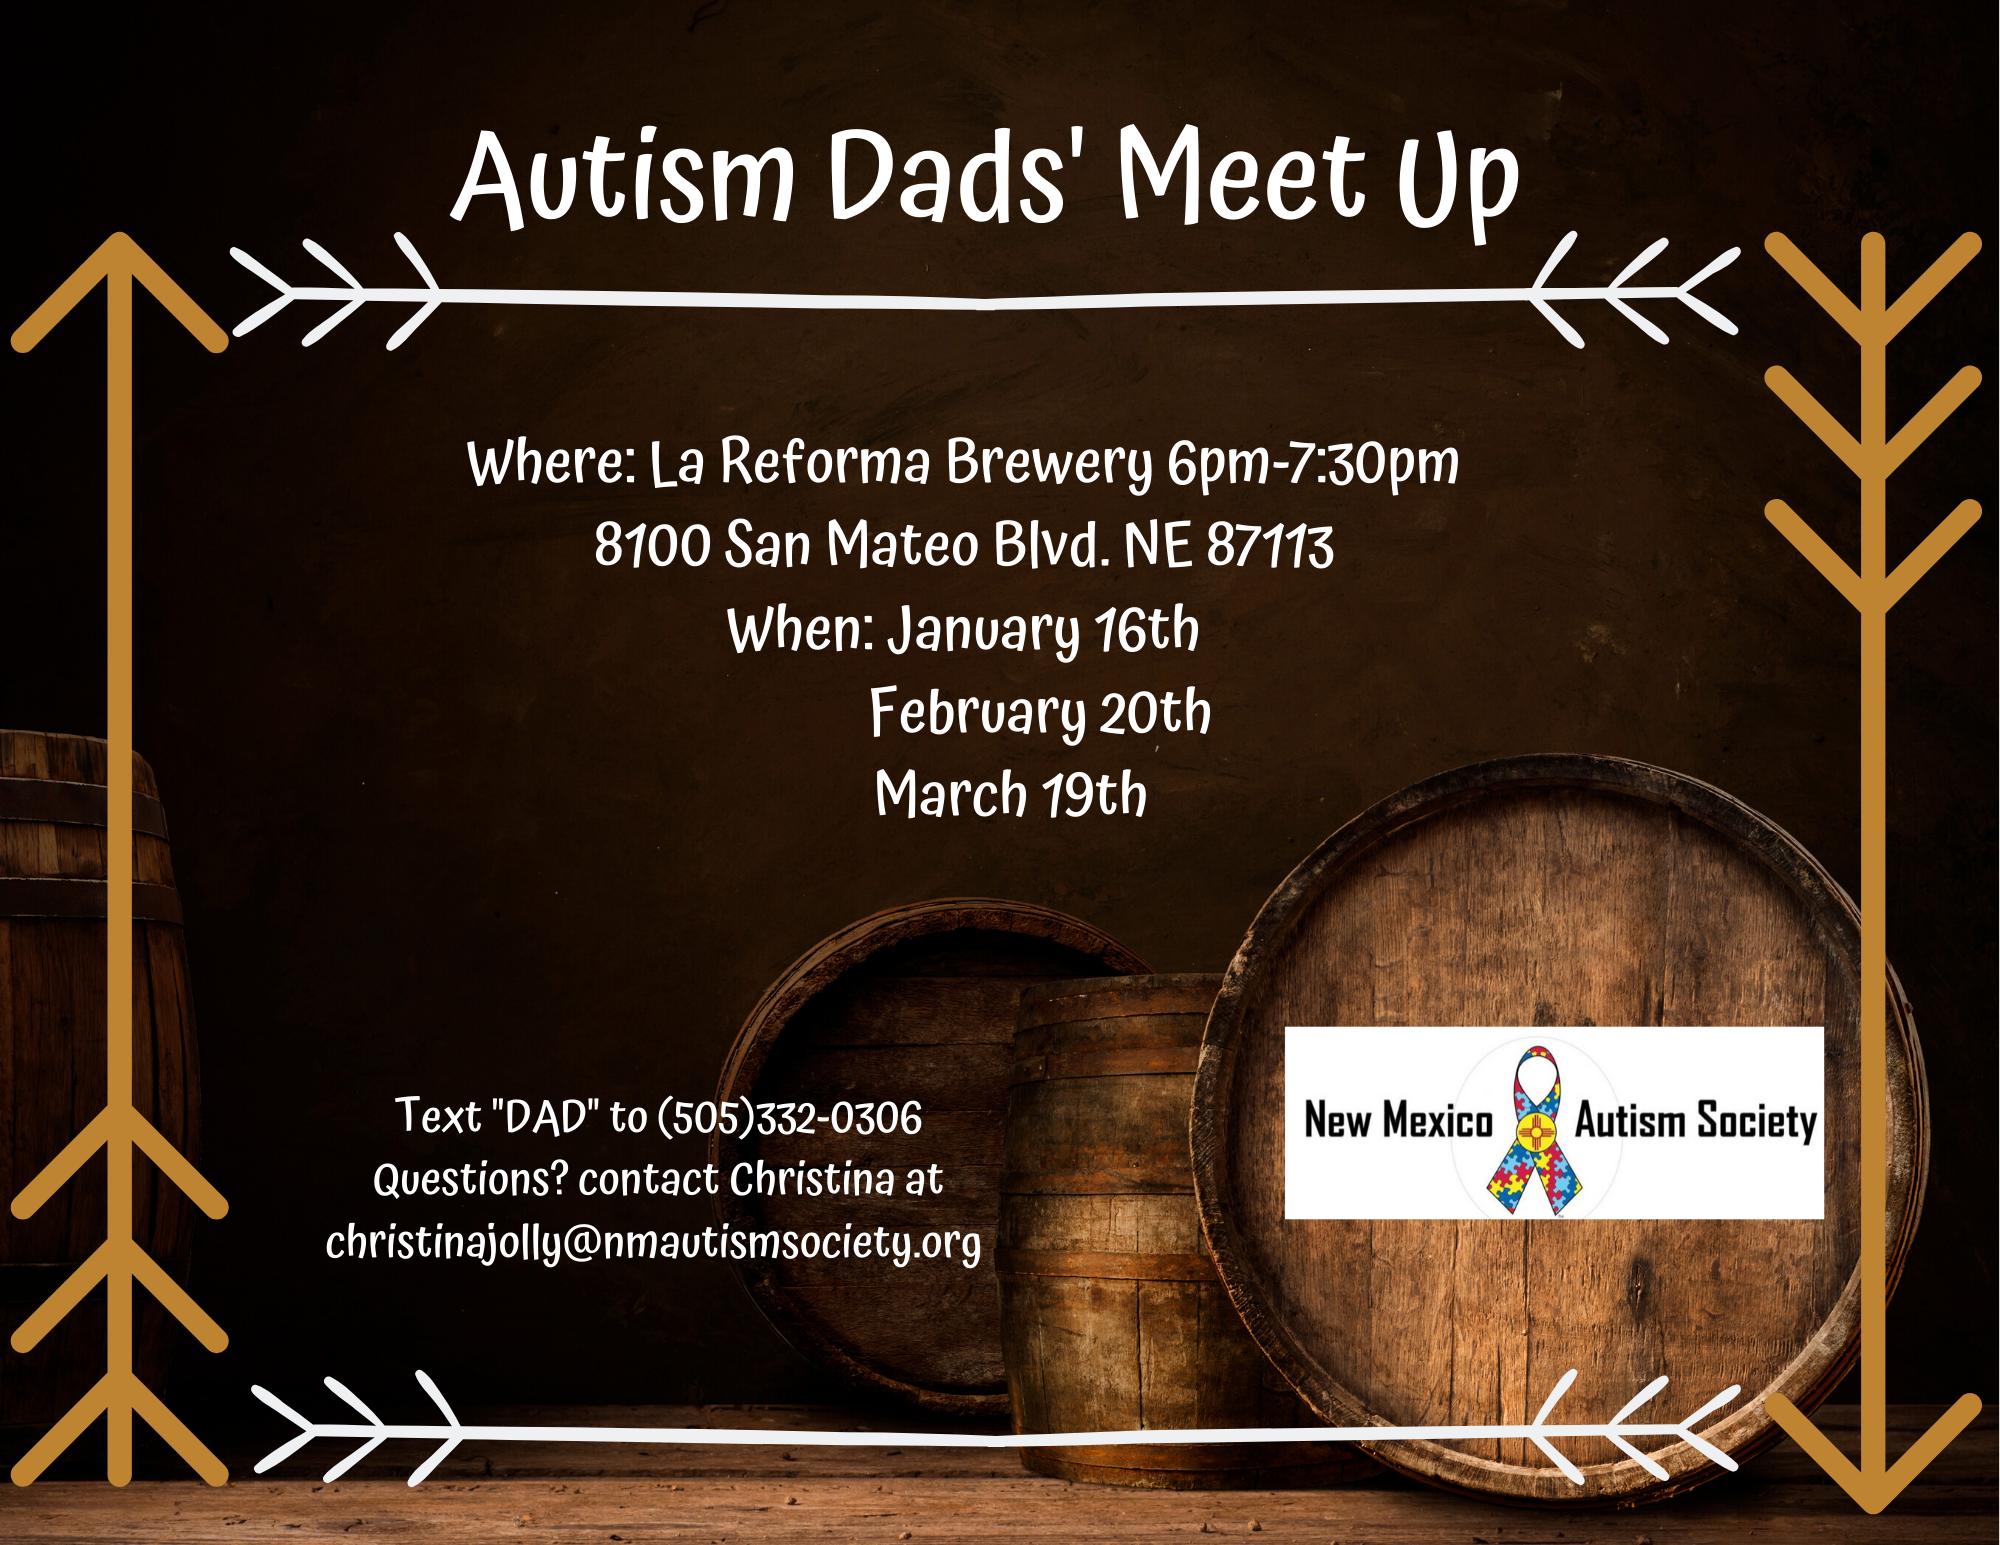 Autism Dads' Meet Up Image